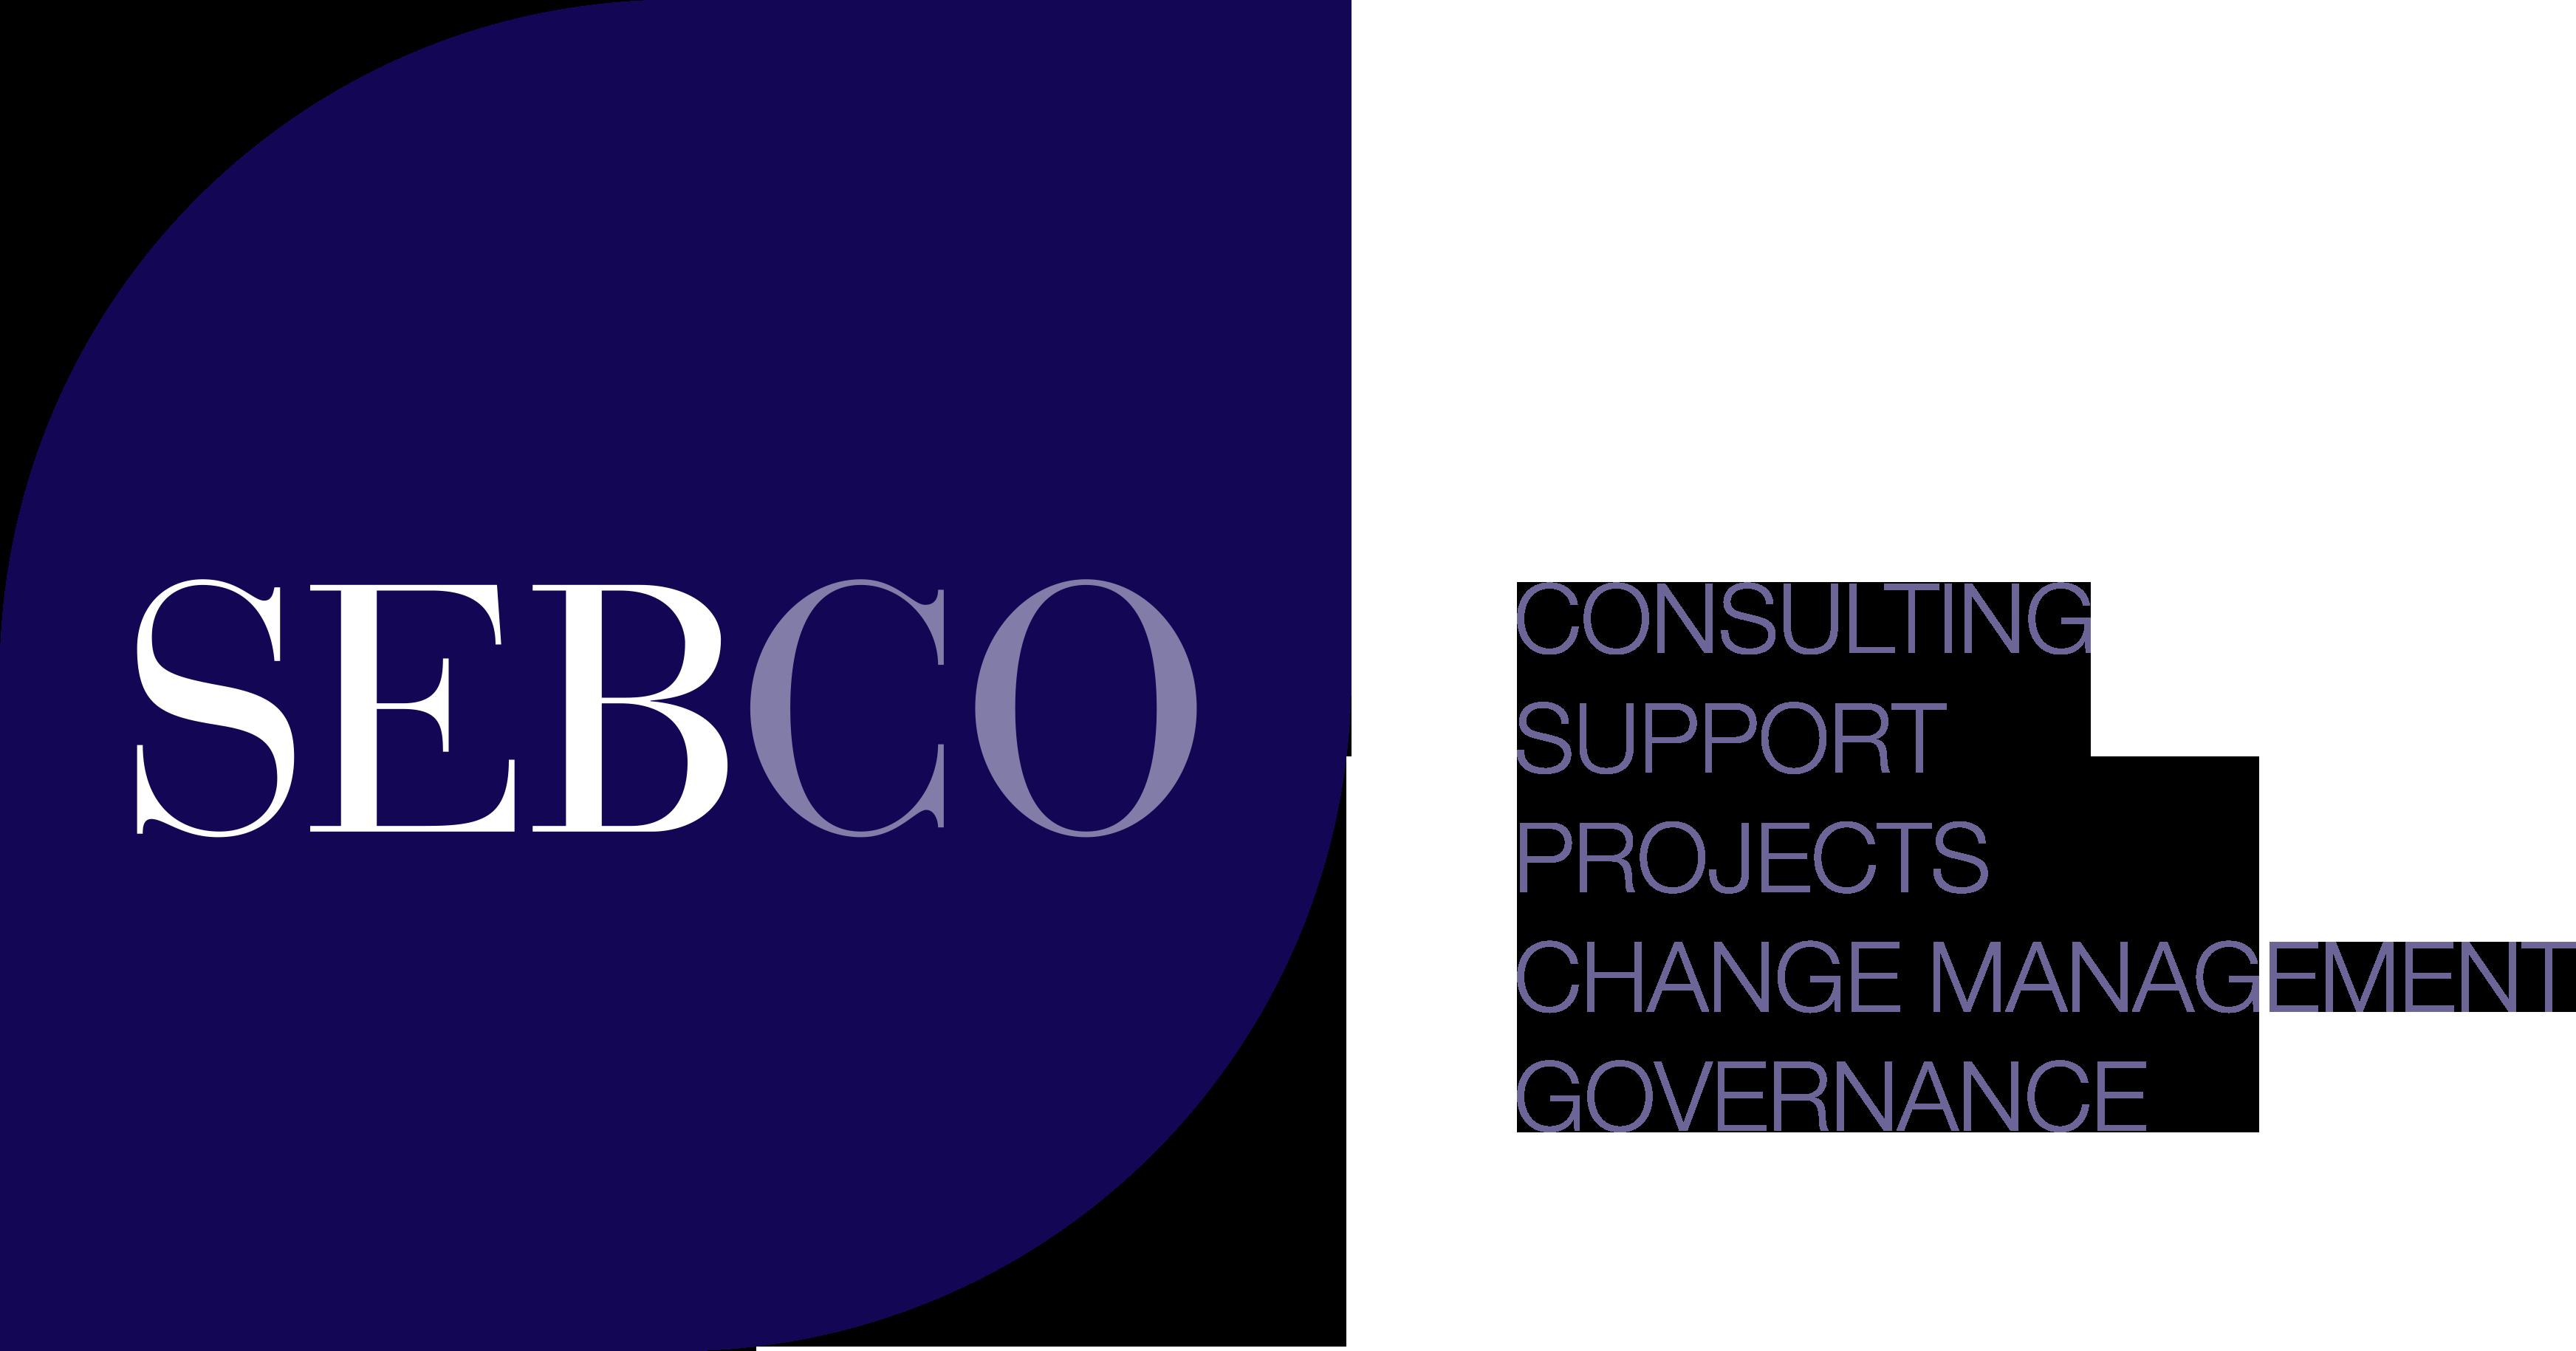 SEBCO Consulting